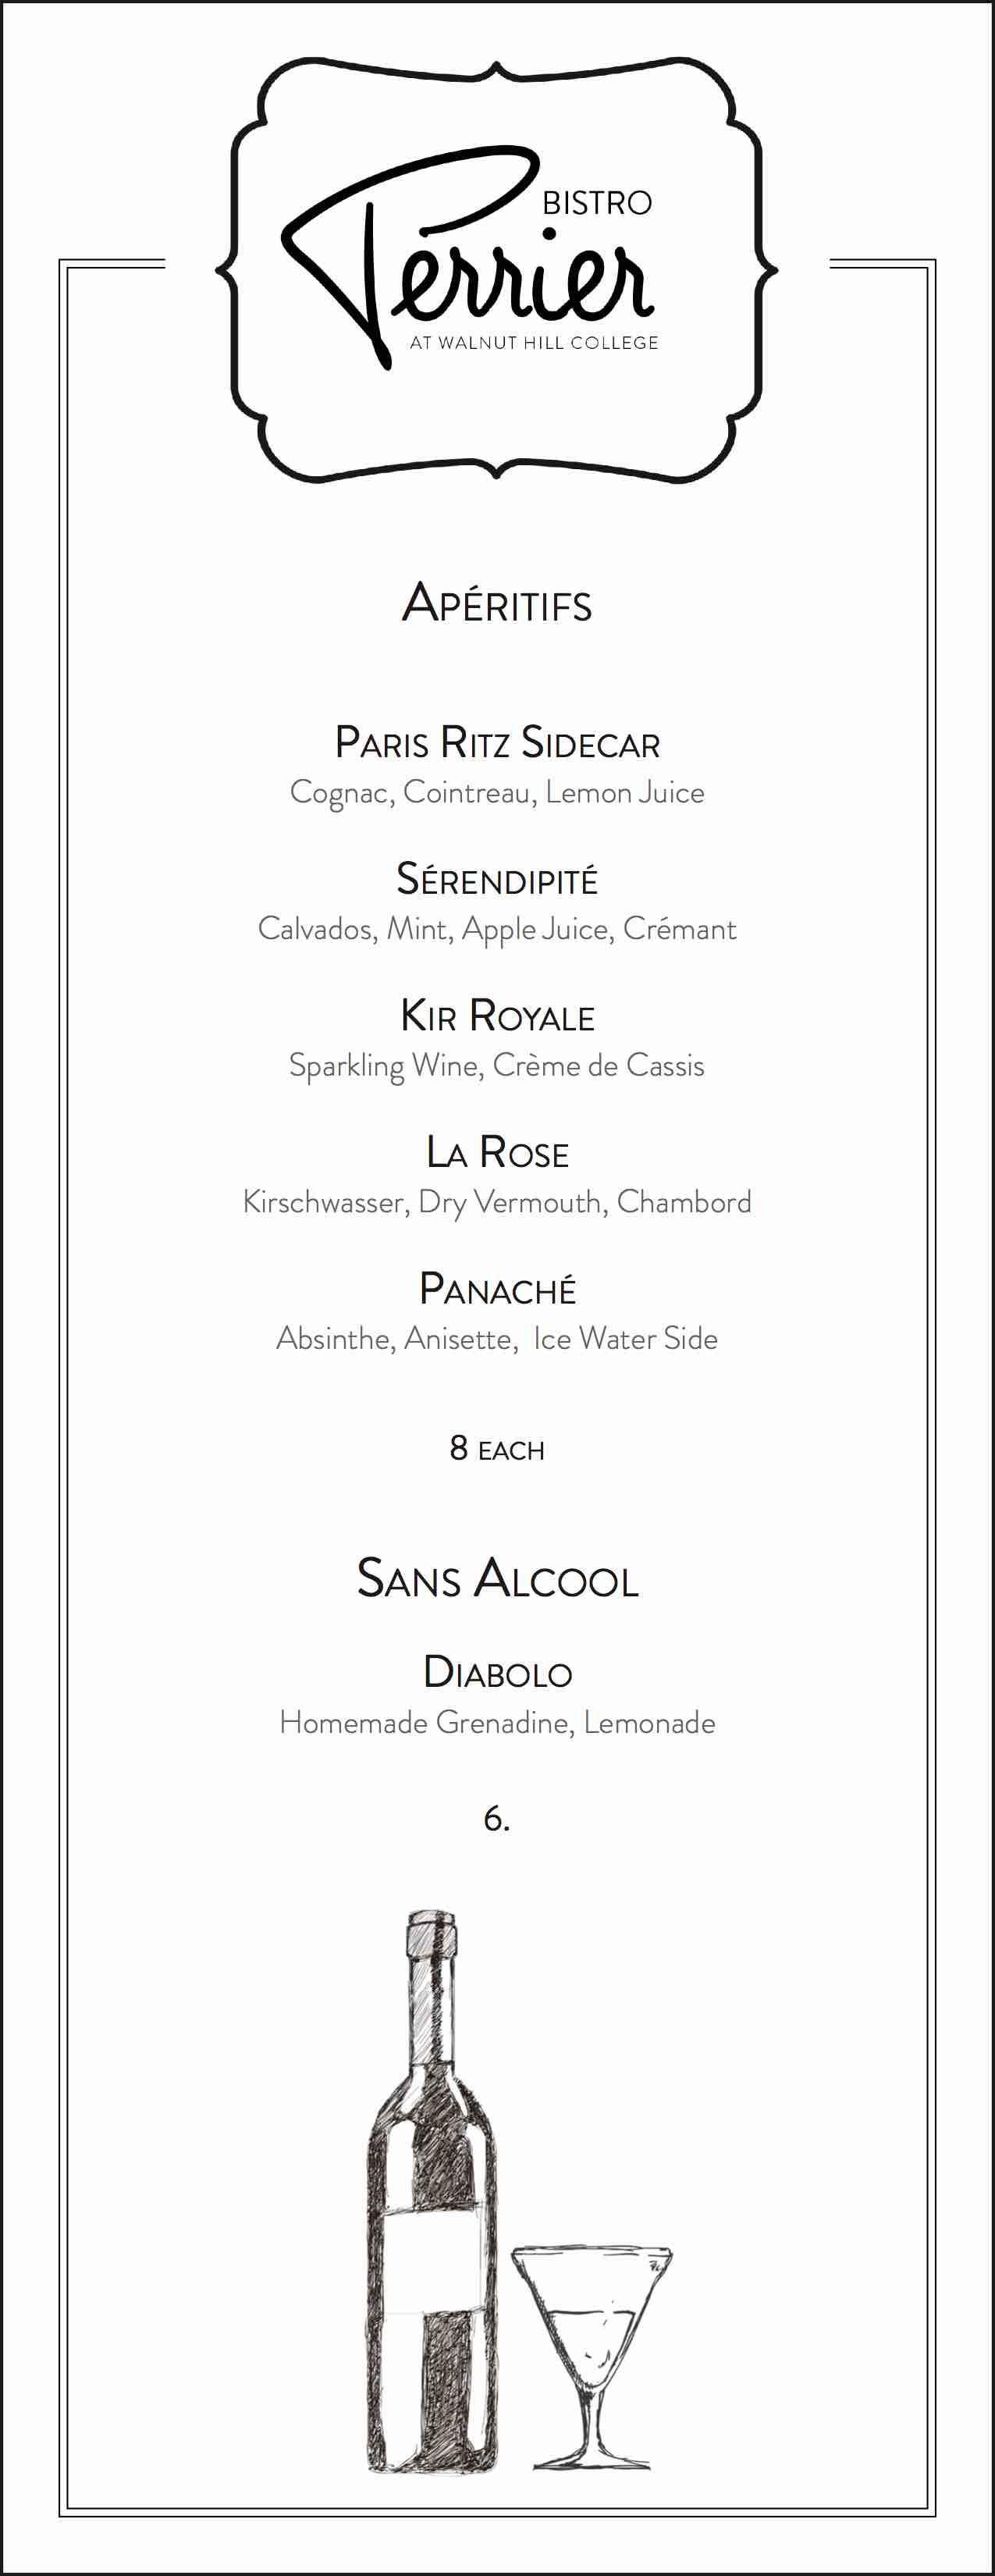 bistro perrier cocktail menu